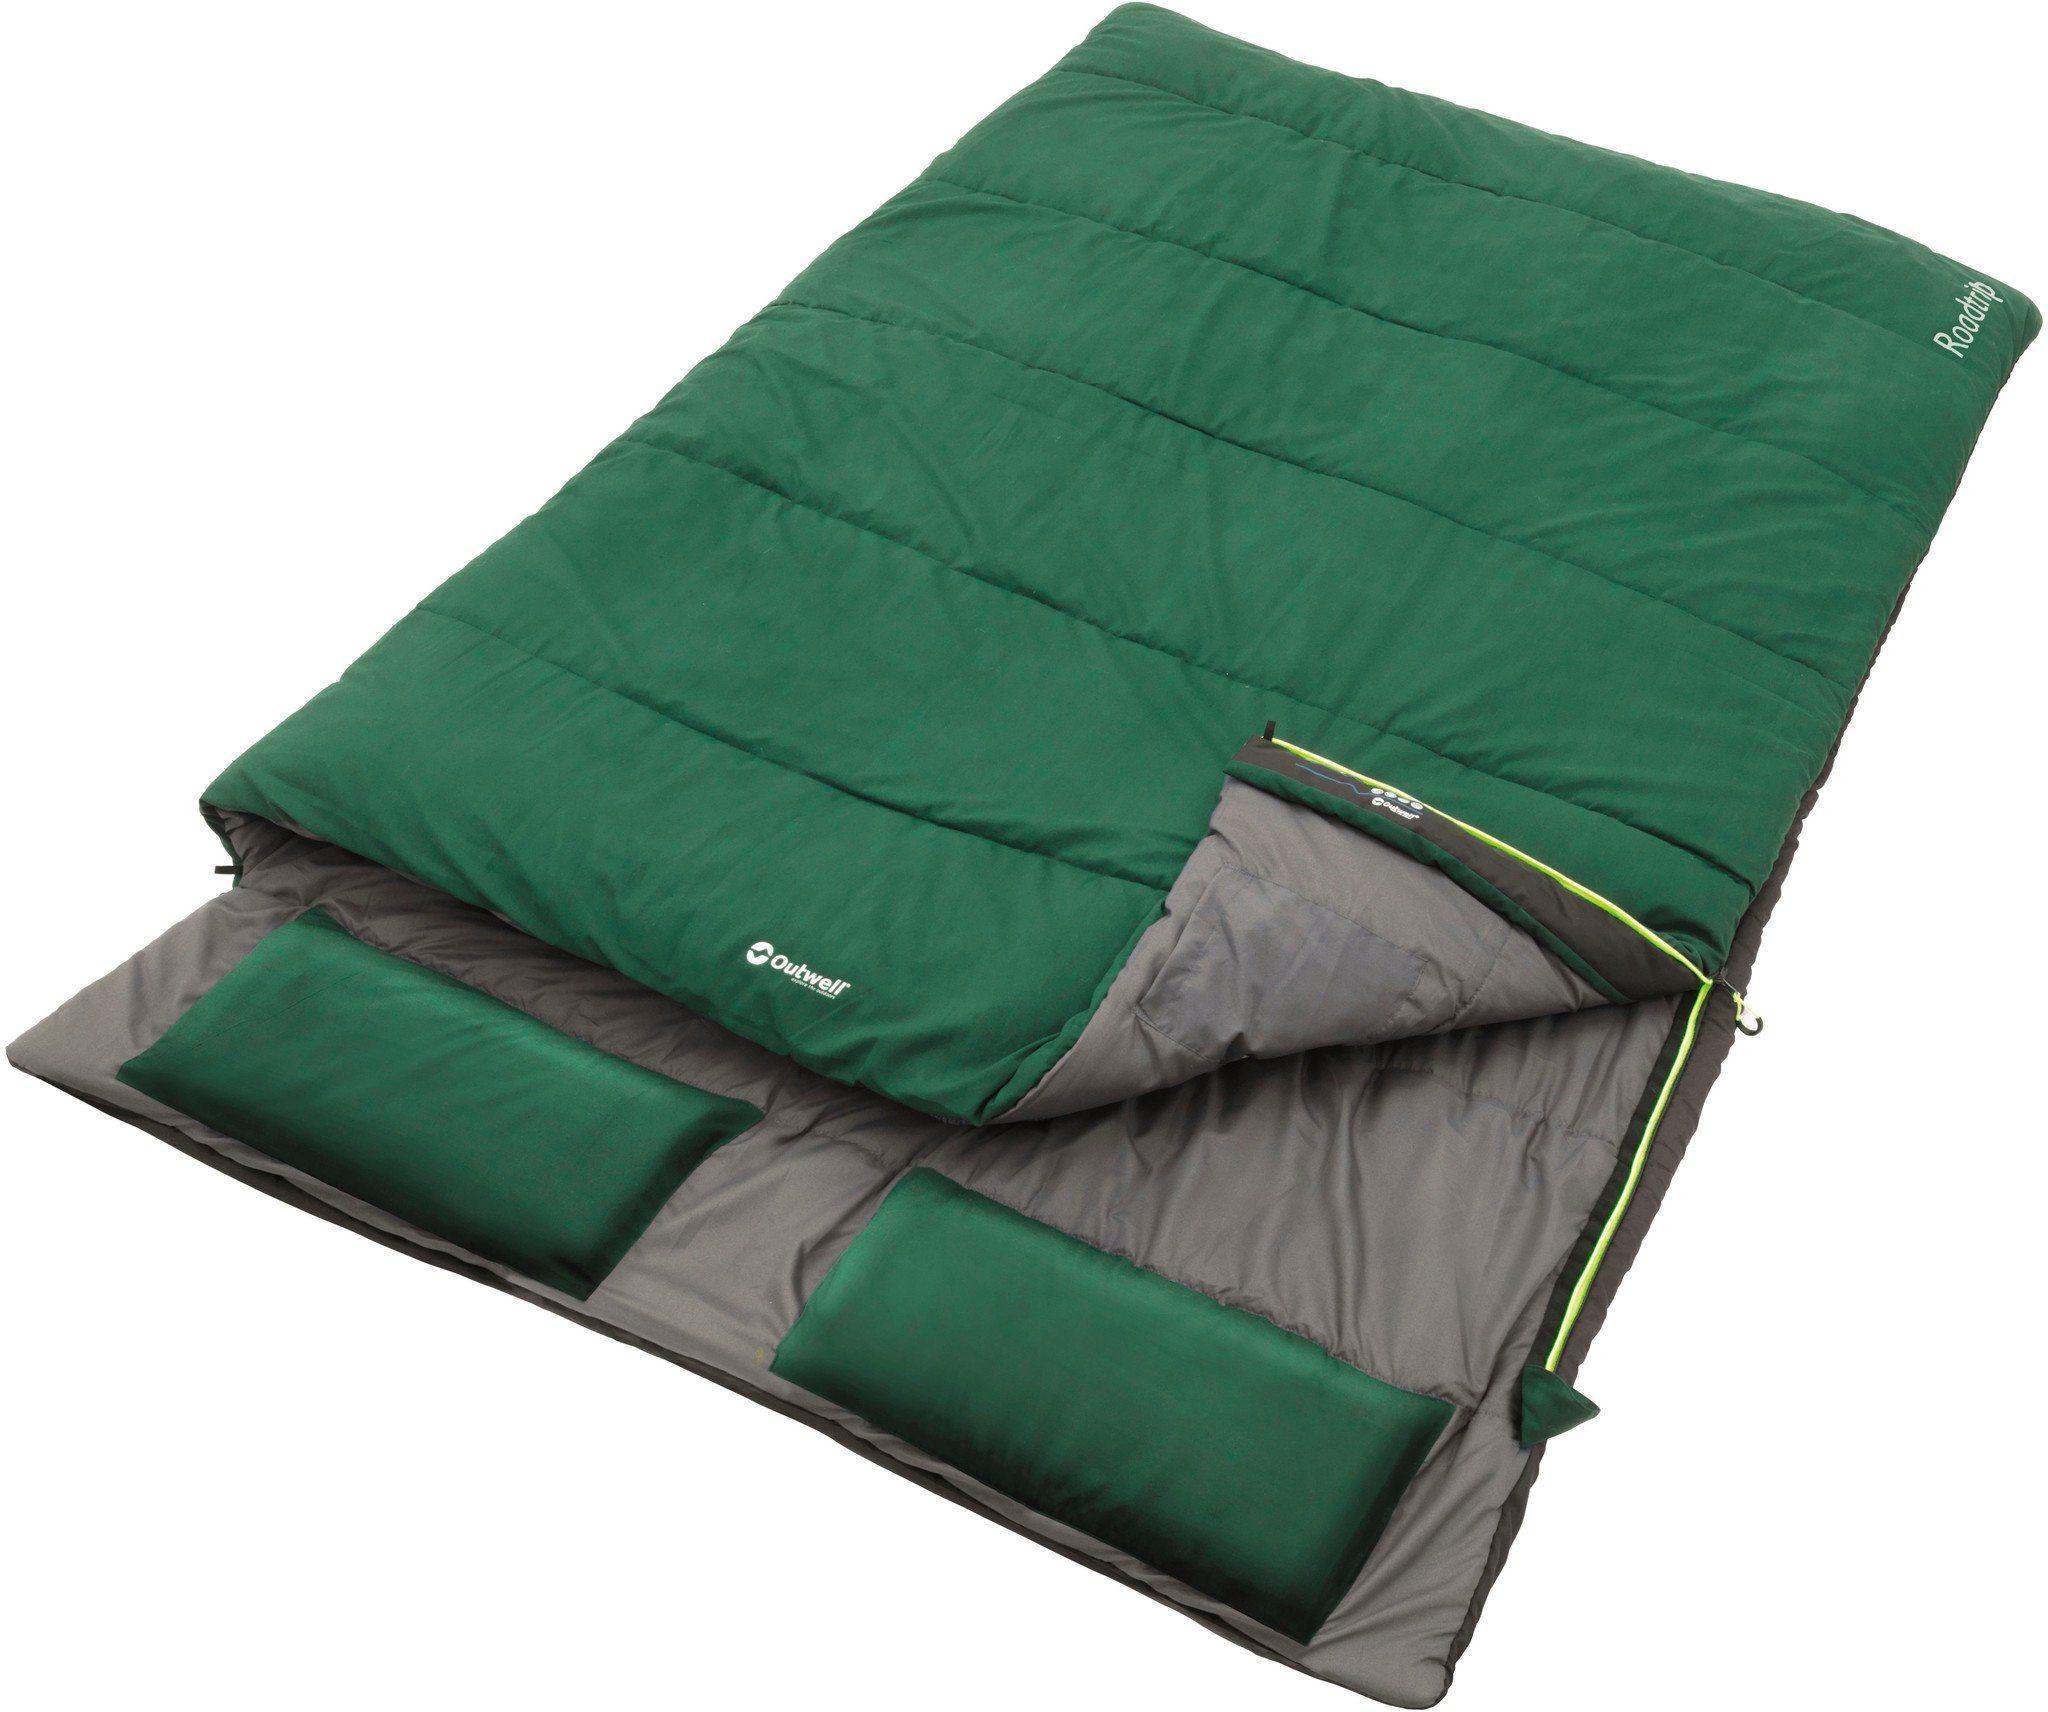 Outwell Wanderrucksack »Roadtrip Sleeping Bag Double«